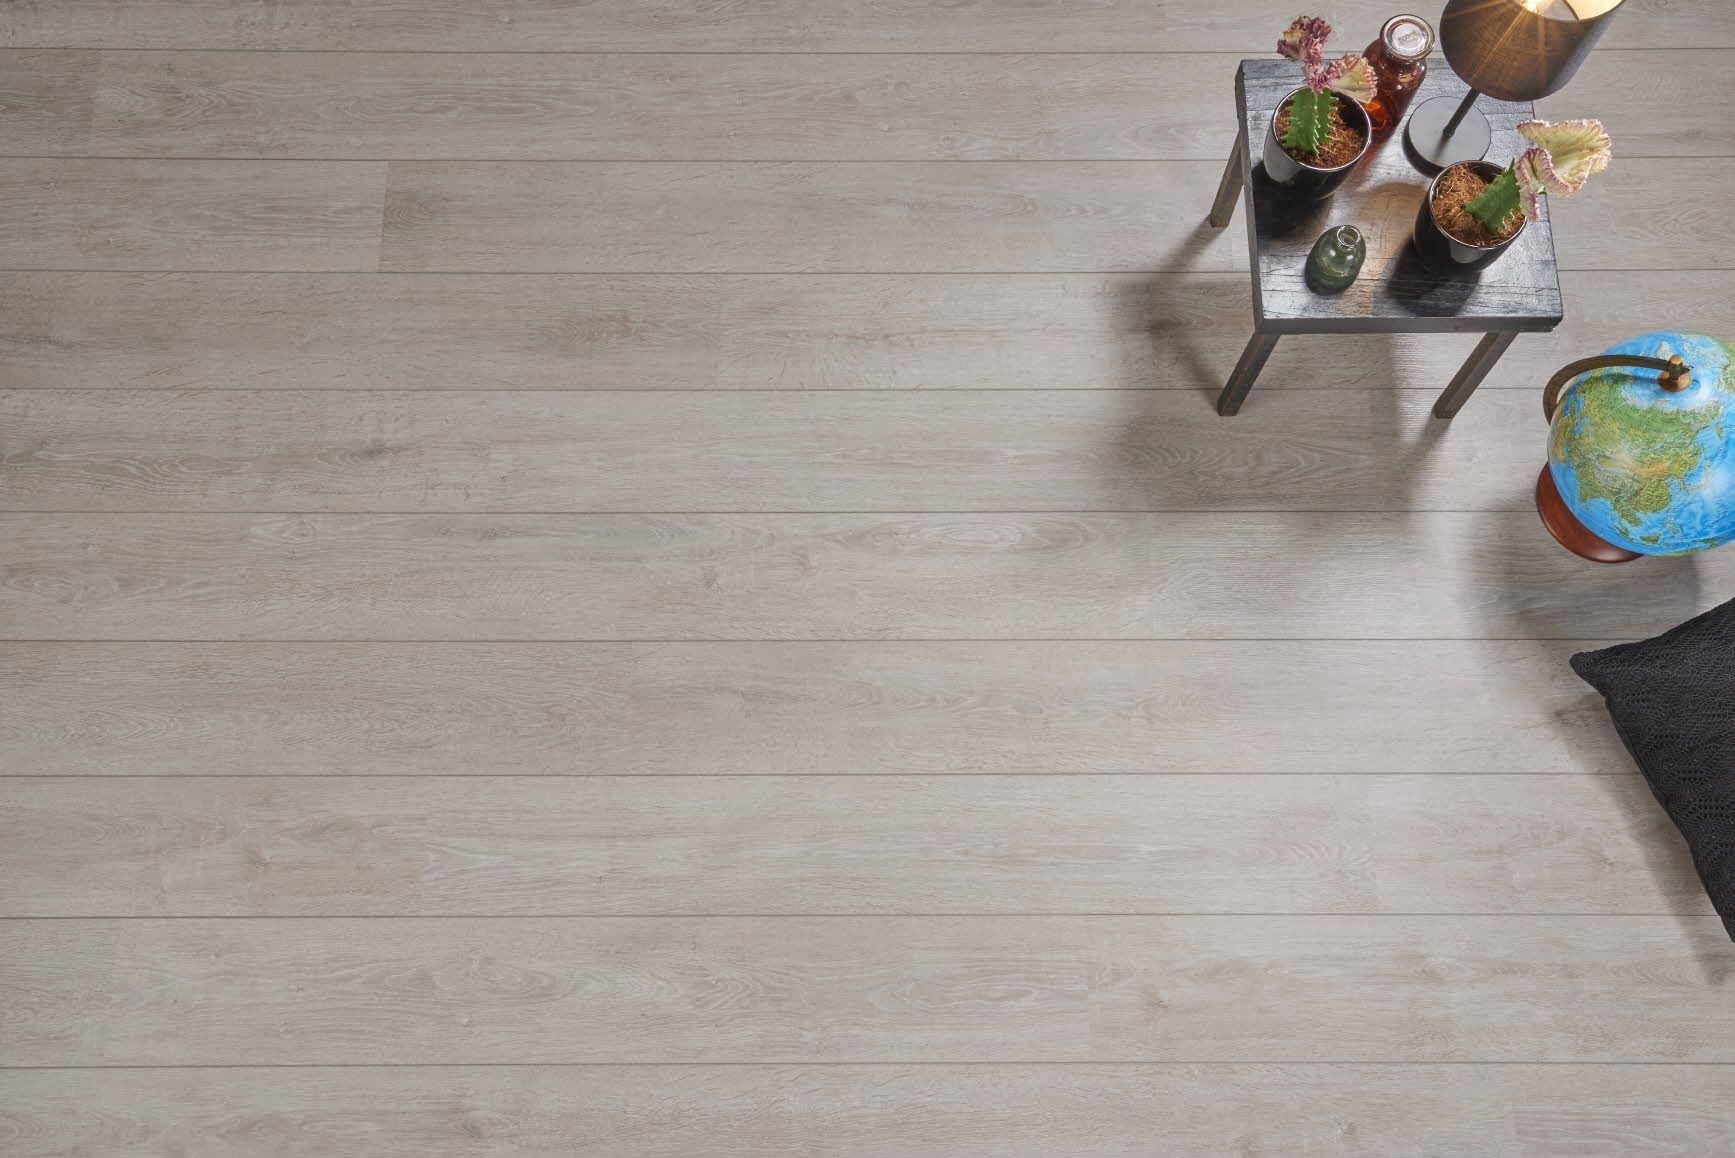 Pvc Laminaat Praxis : Praxis laminaat light grey oak vloer inspiratie praxis in